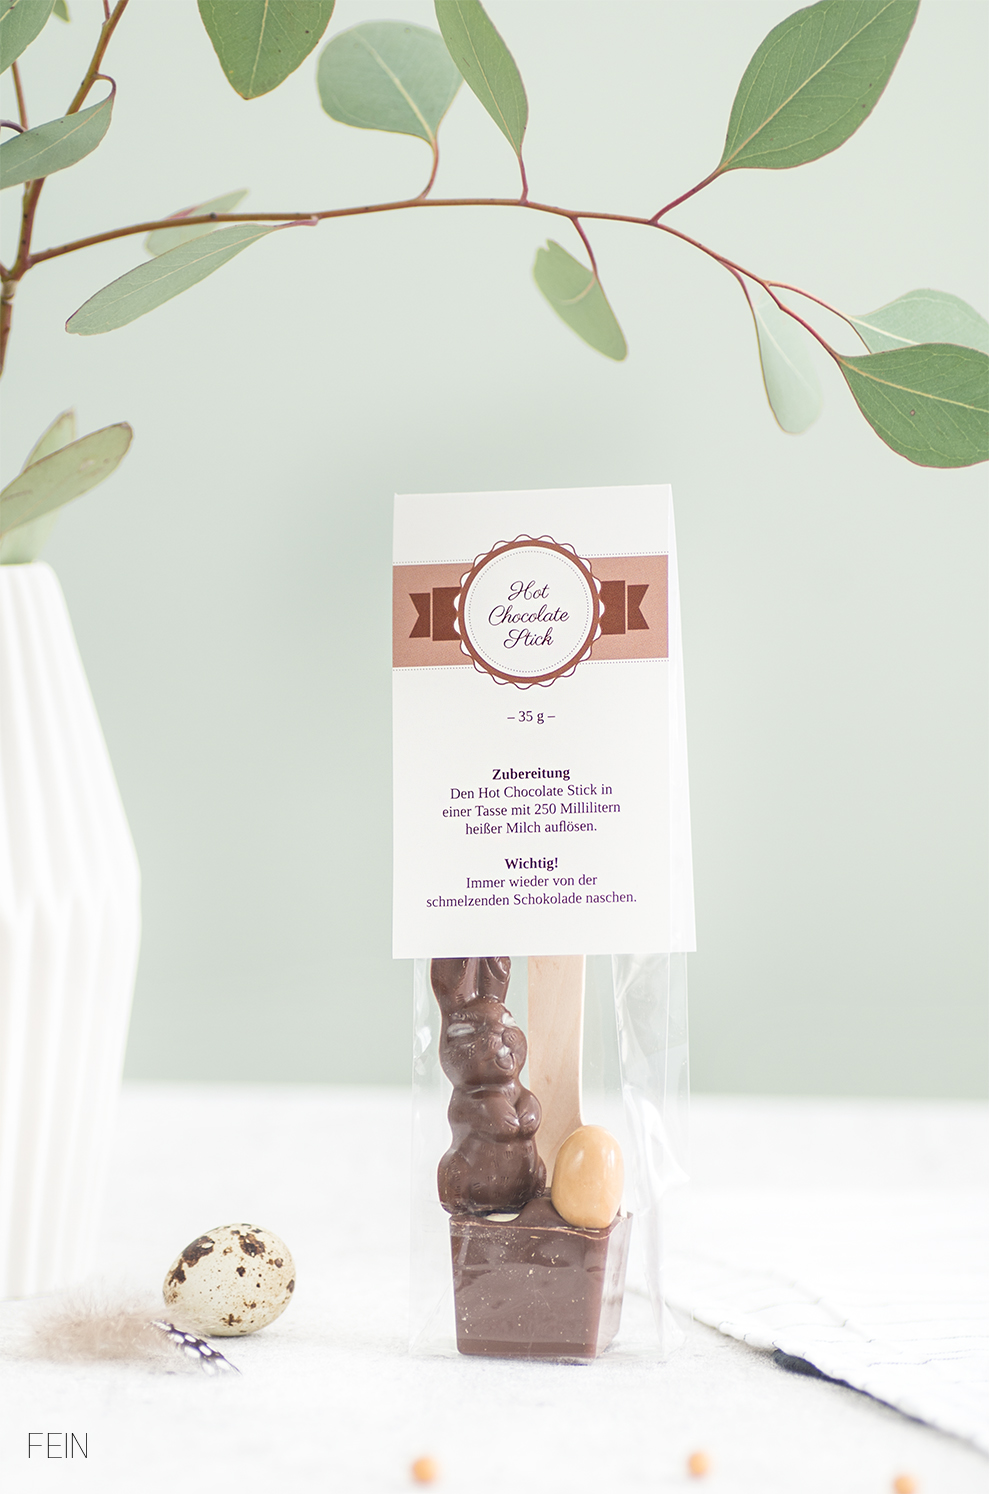 Sweet Table Schokolade Osterhase Schoko